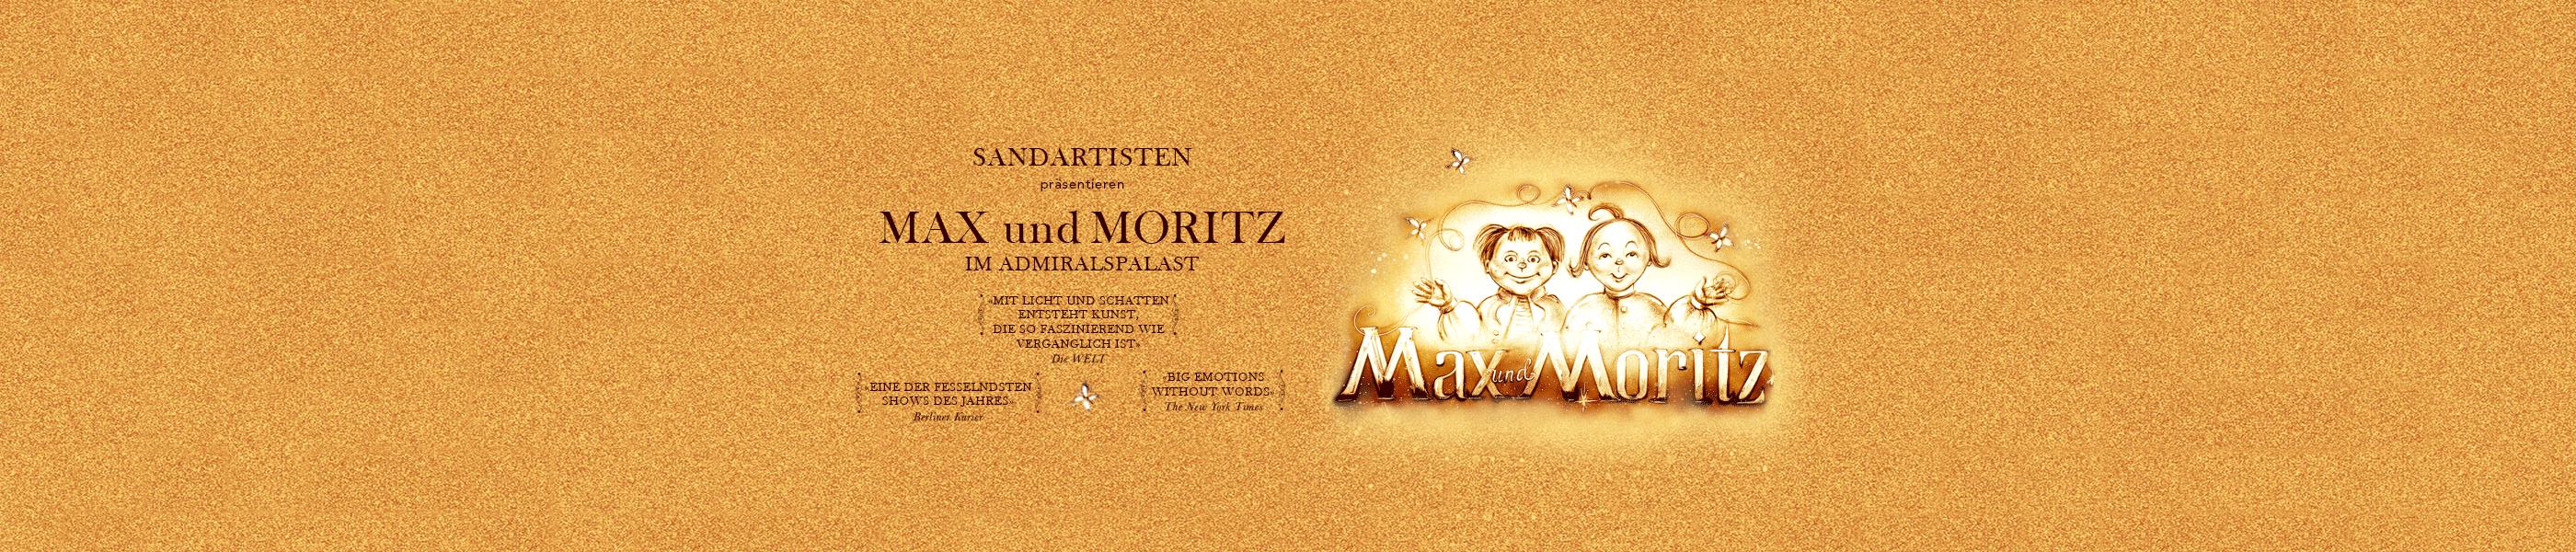 2800x600_MAX-und-MORITZ_v2